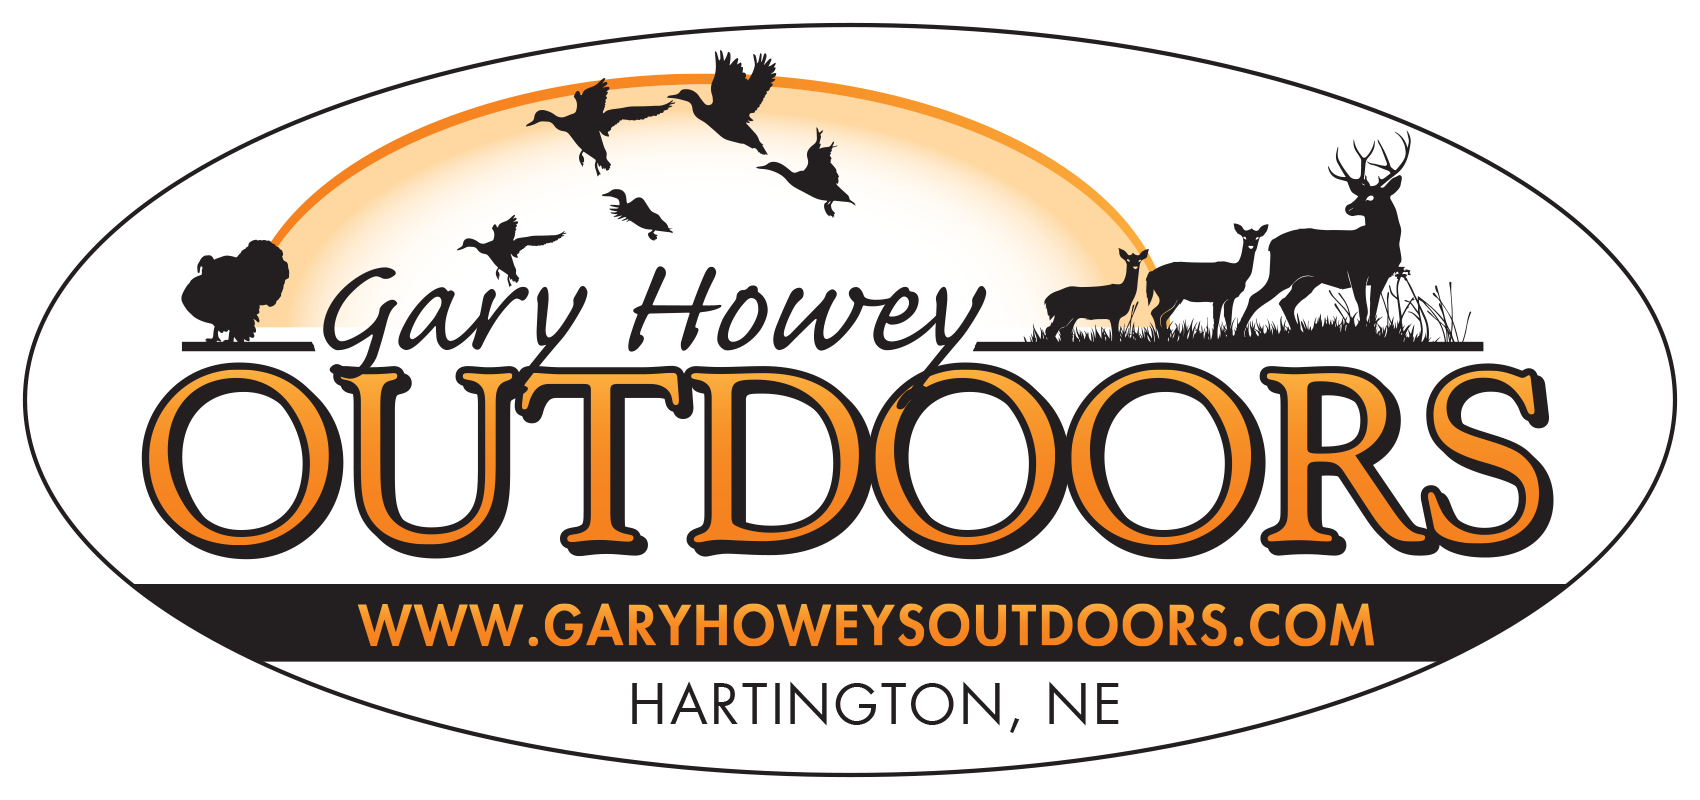 Gary Howey's Outdoors